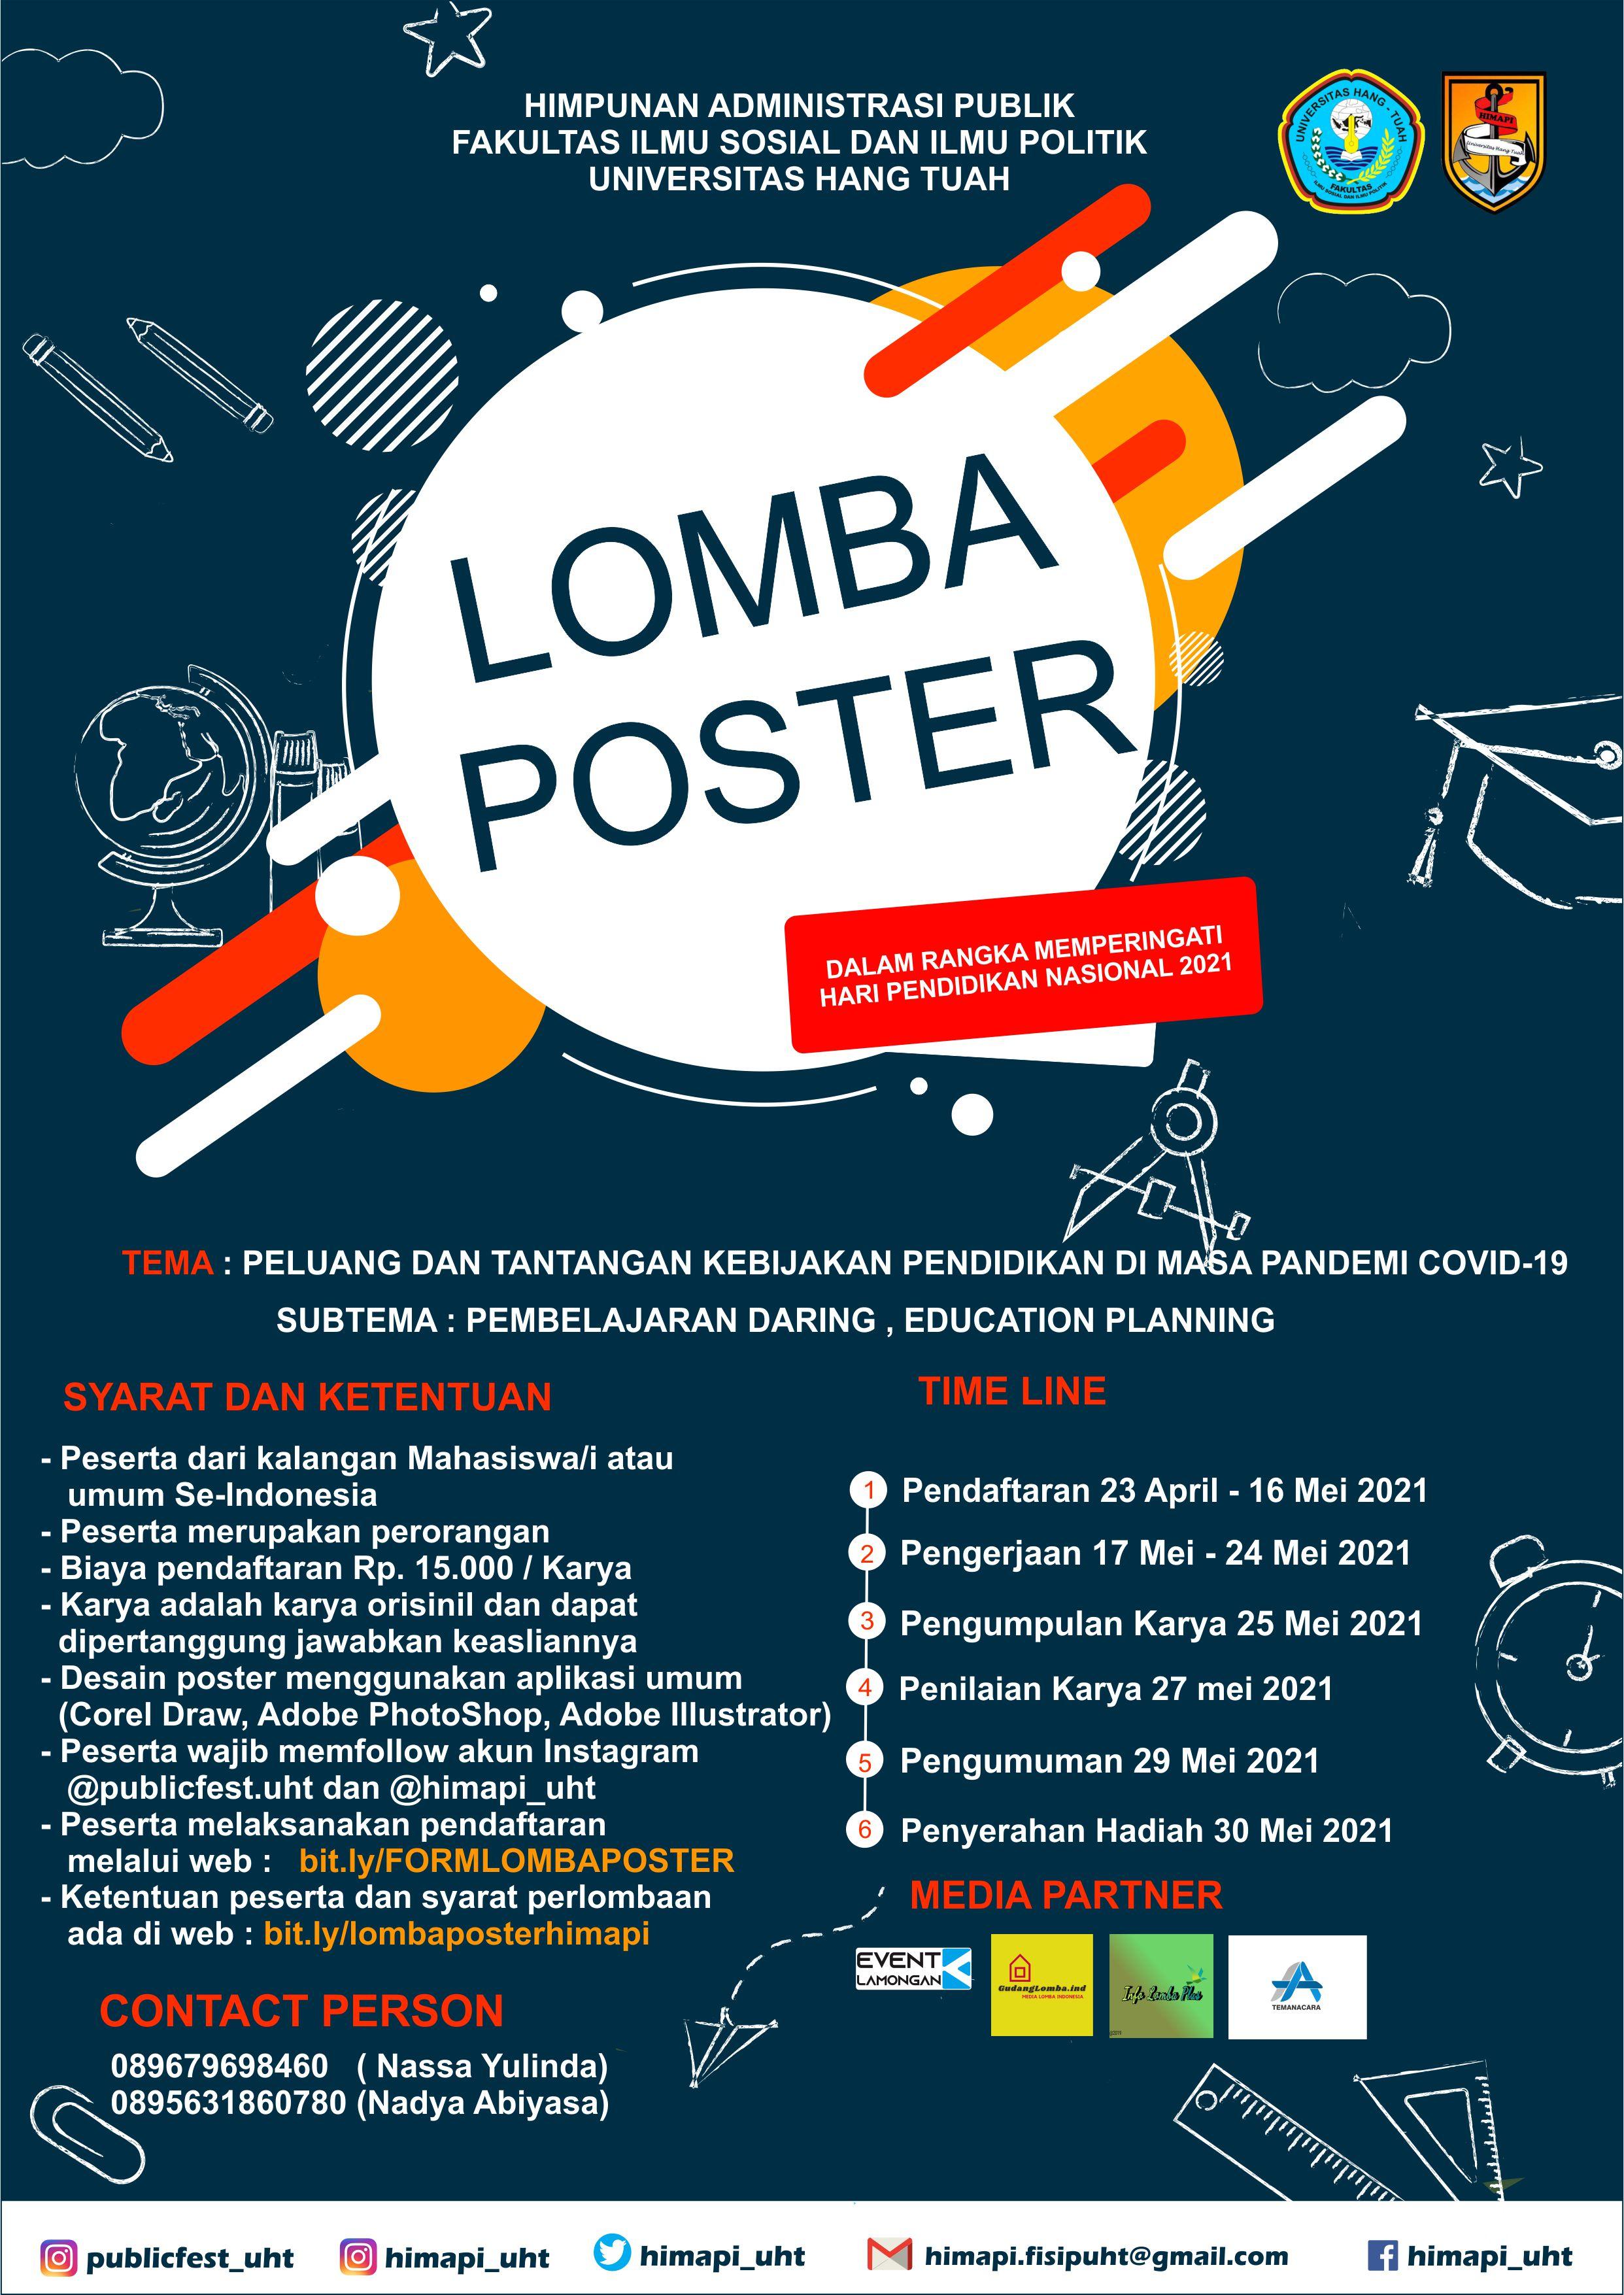 Poster Competition Universitas Hang Tuah Surabaya